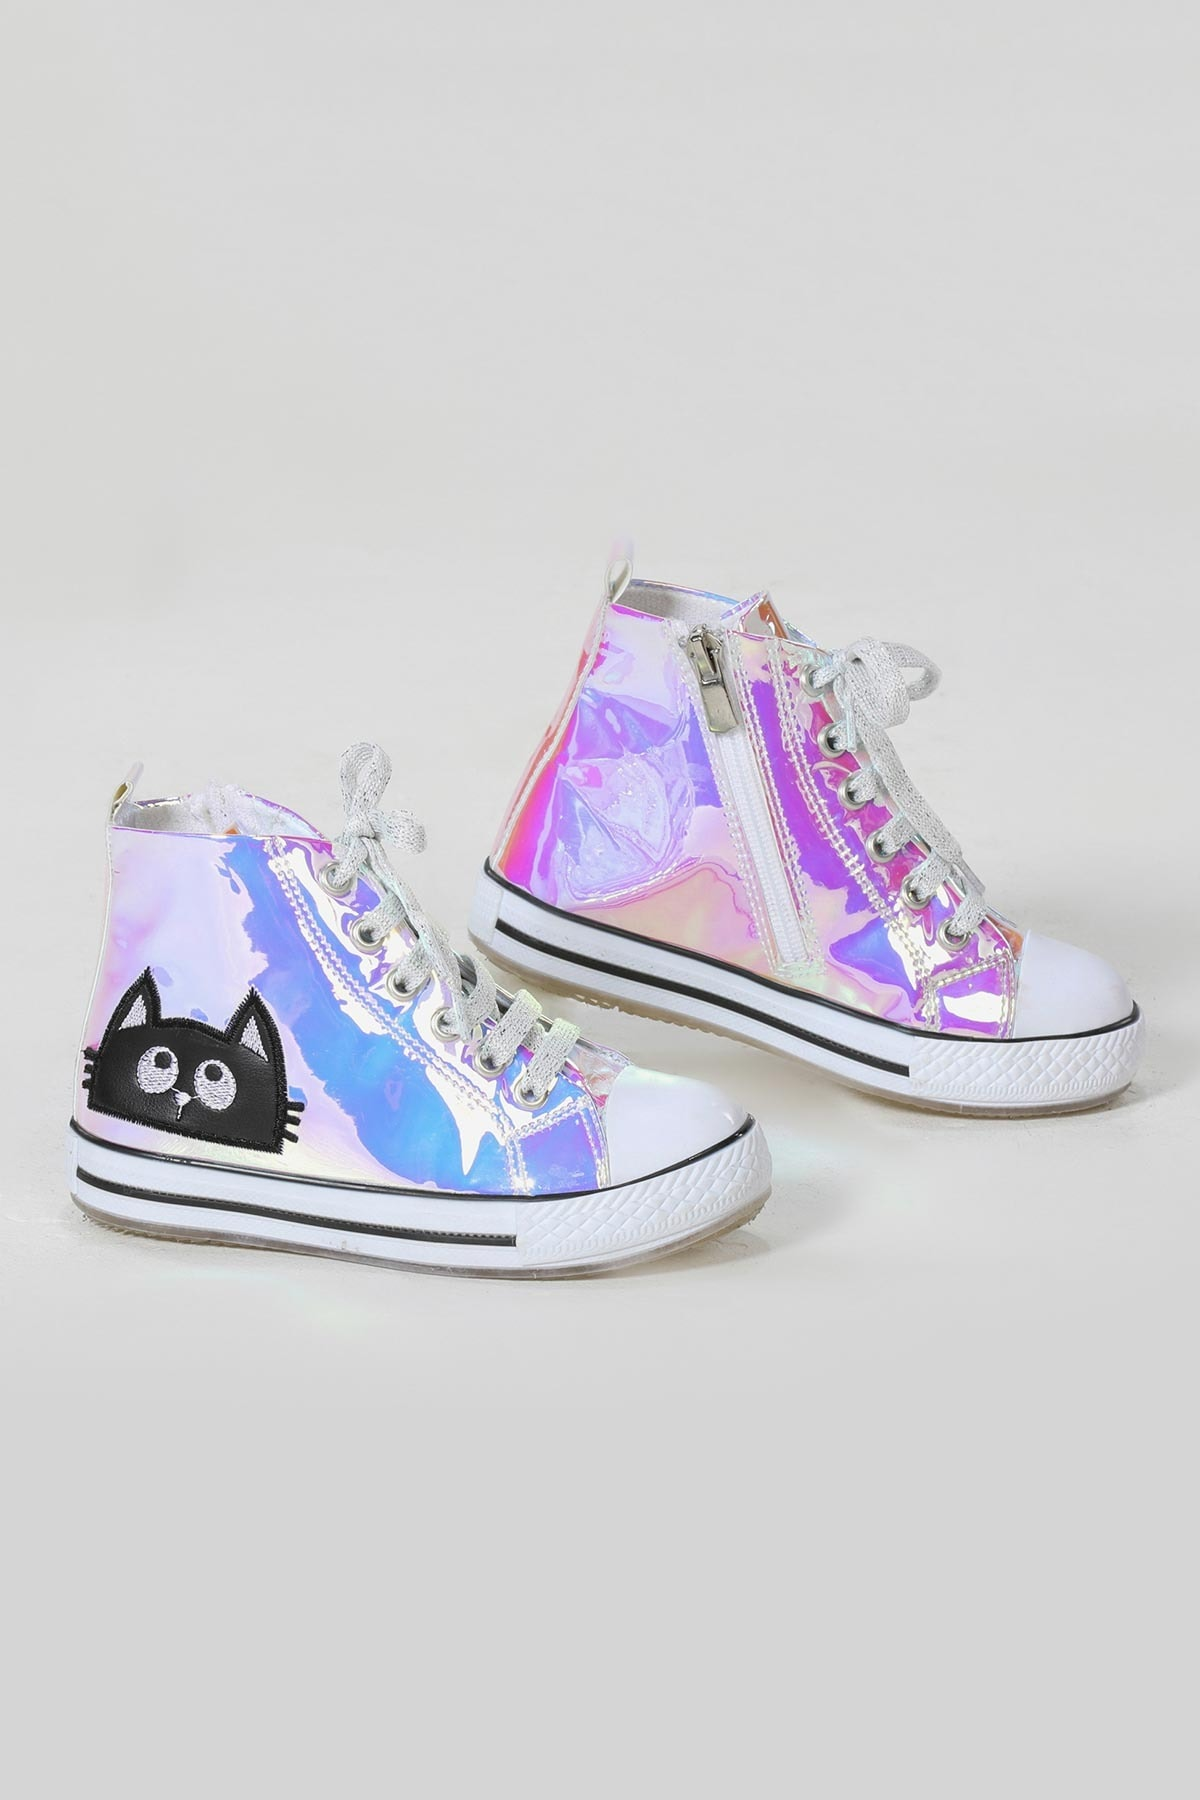 ZENOKIDO Kedi Pembe Hologramlı Kız Sneakers Ayakkabı 1